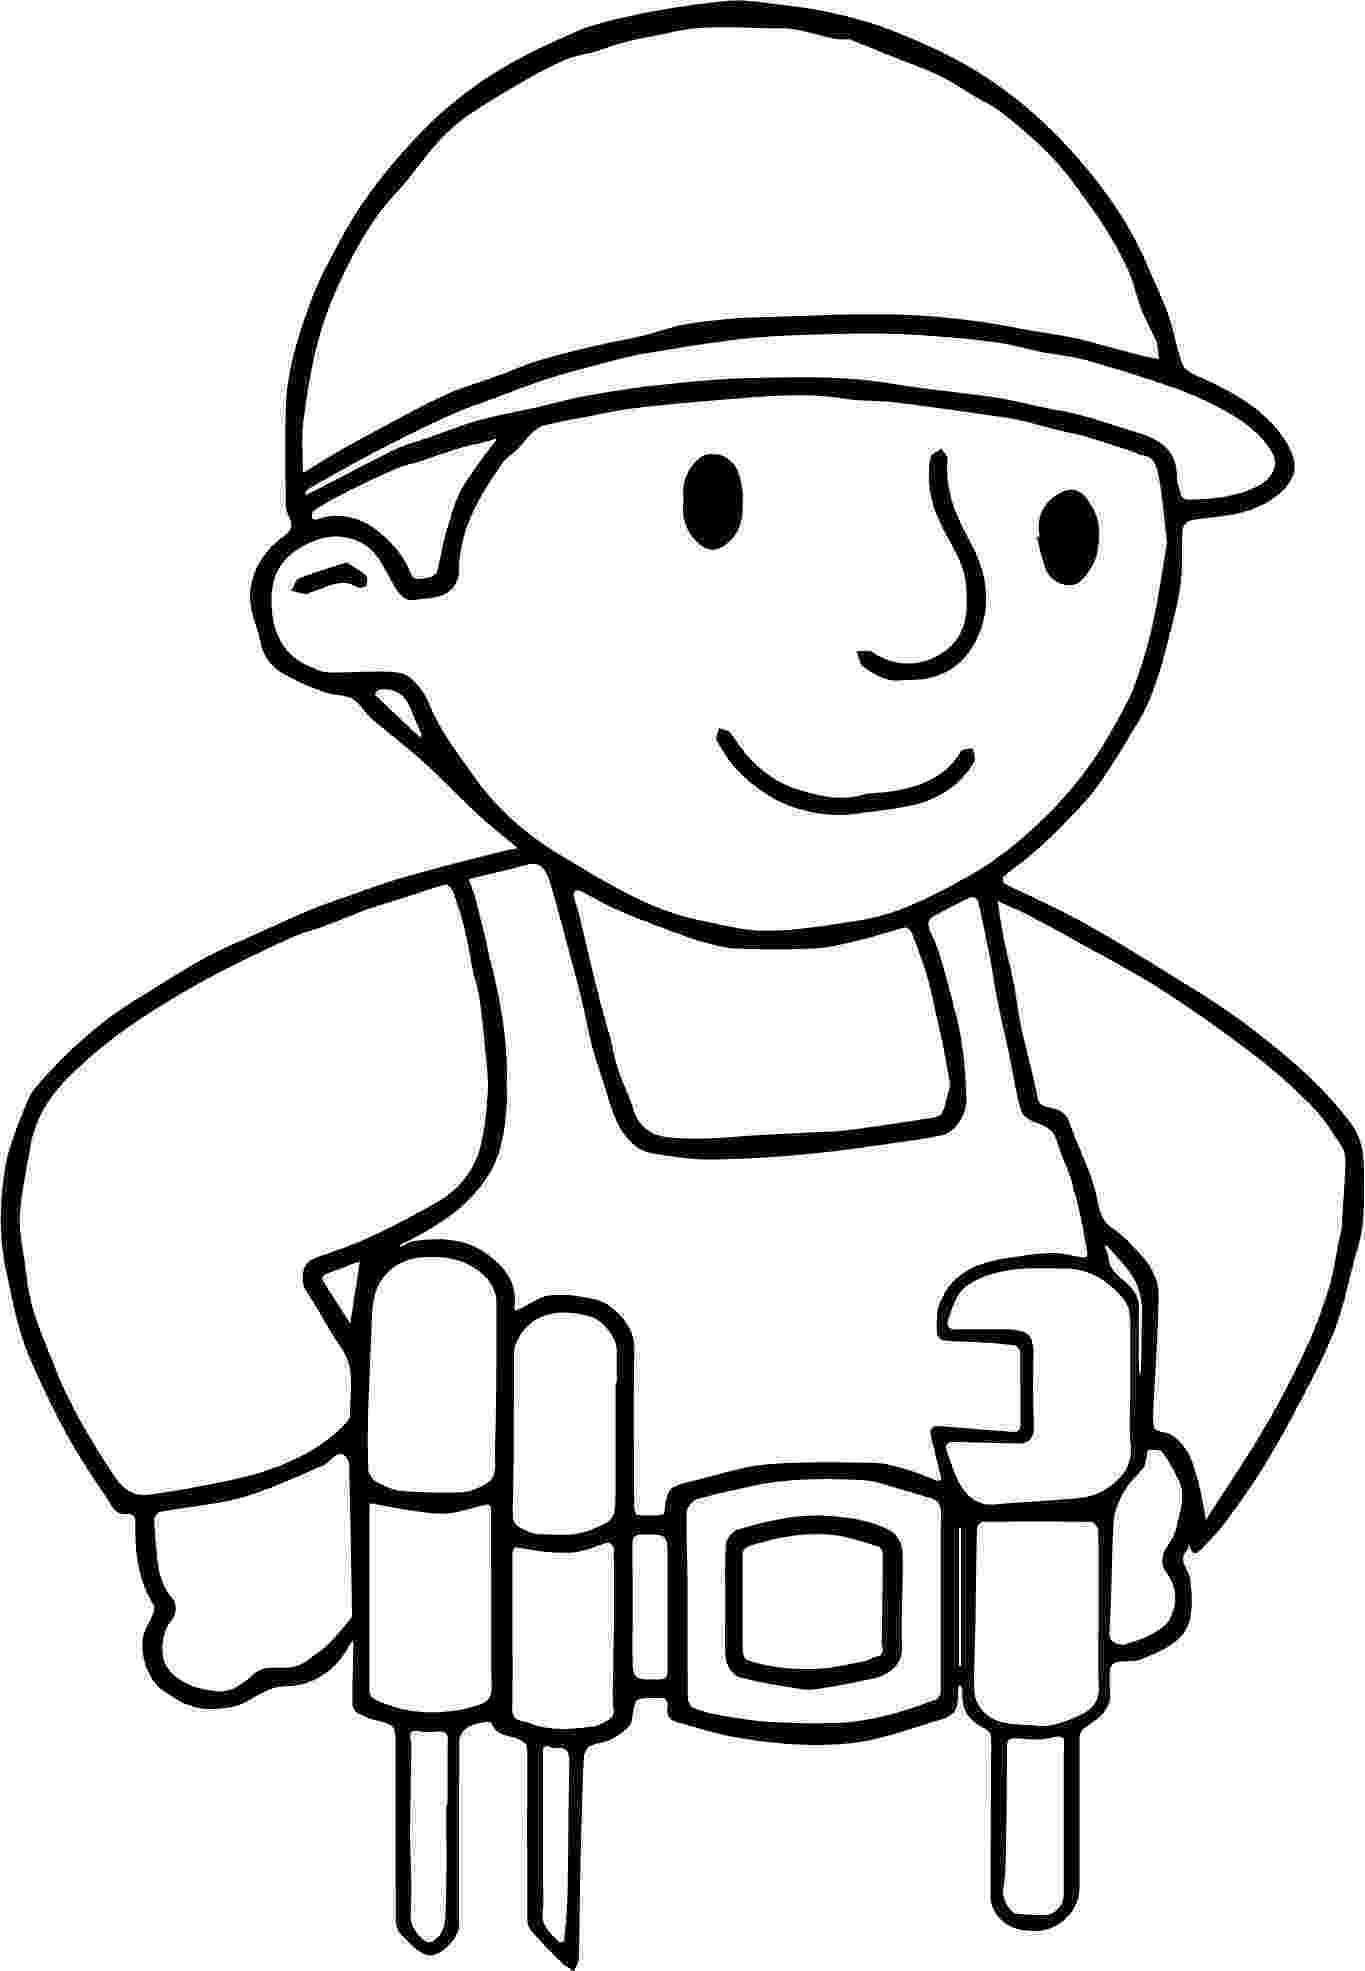 carpenter coloring pages carpenter worker coloring page wecoloringpagecom pages coloring carpenter